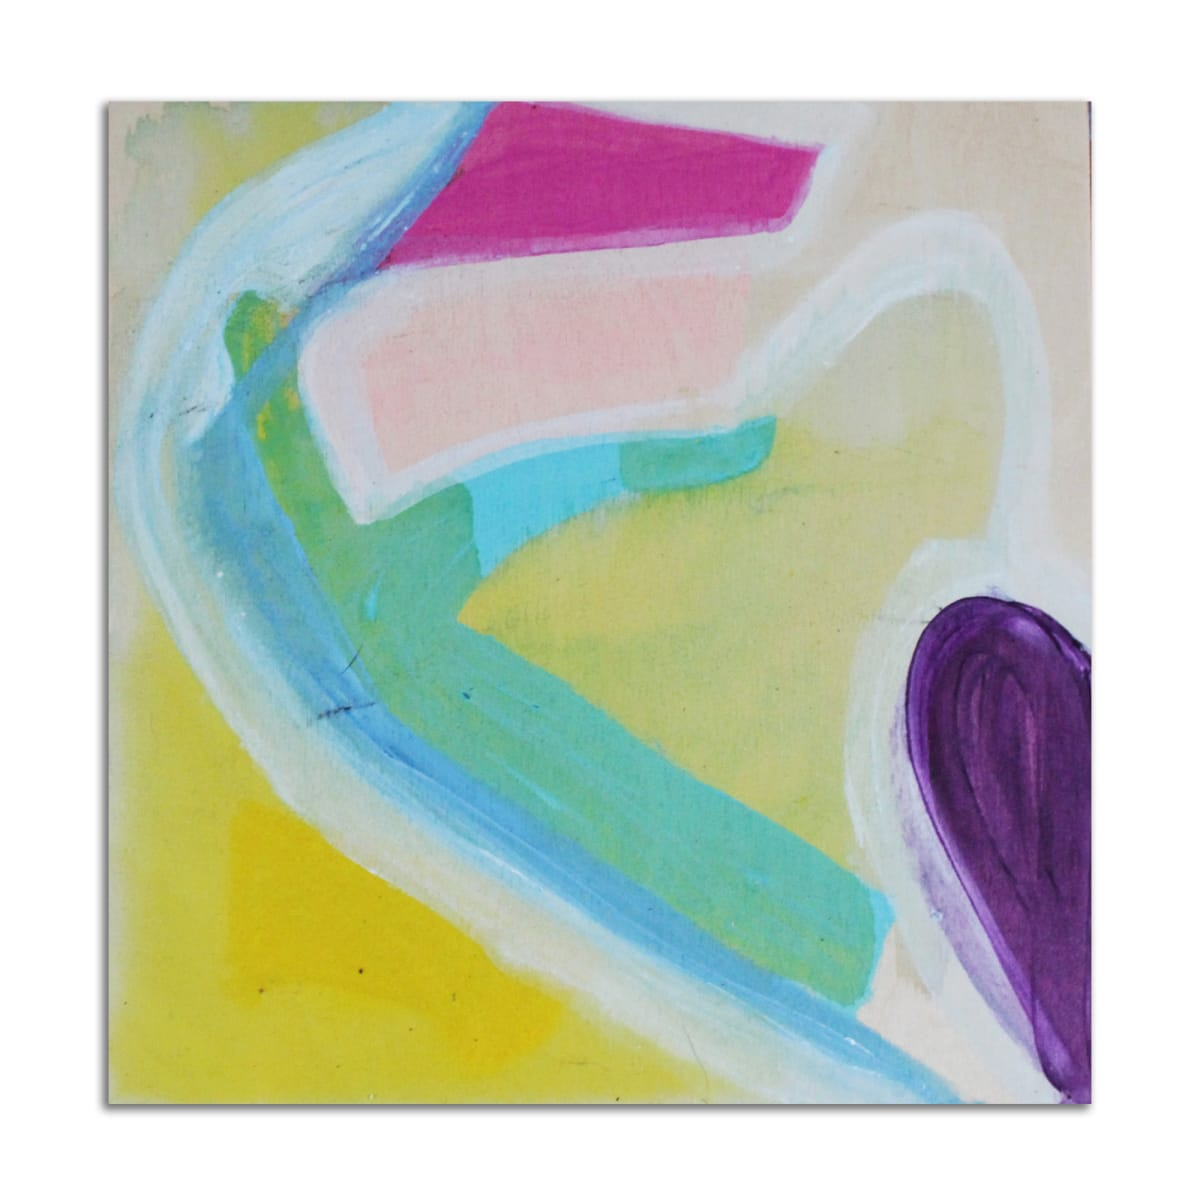 Salt Pond VI by Meganne Rosen